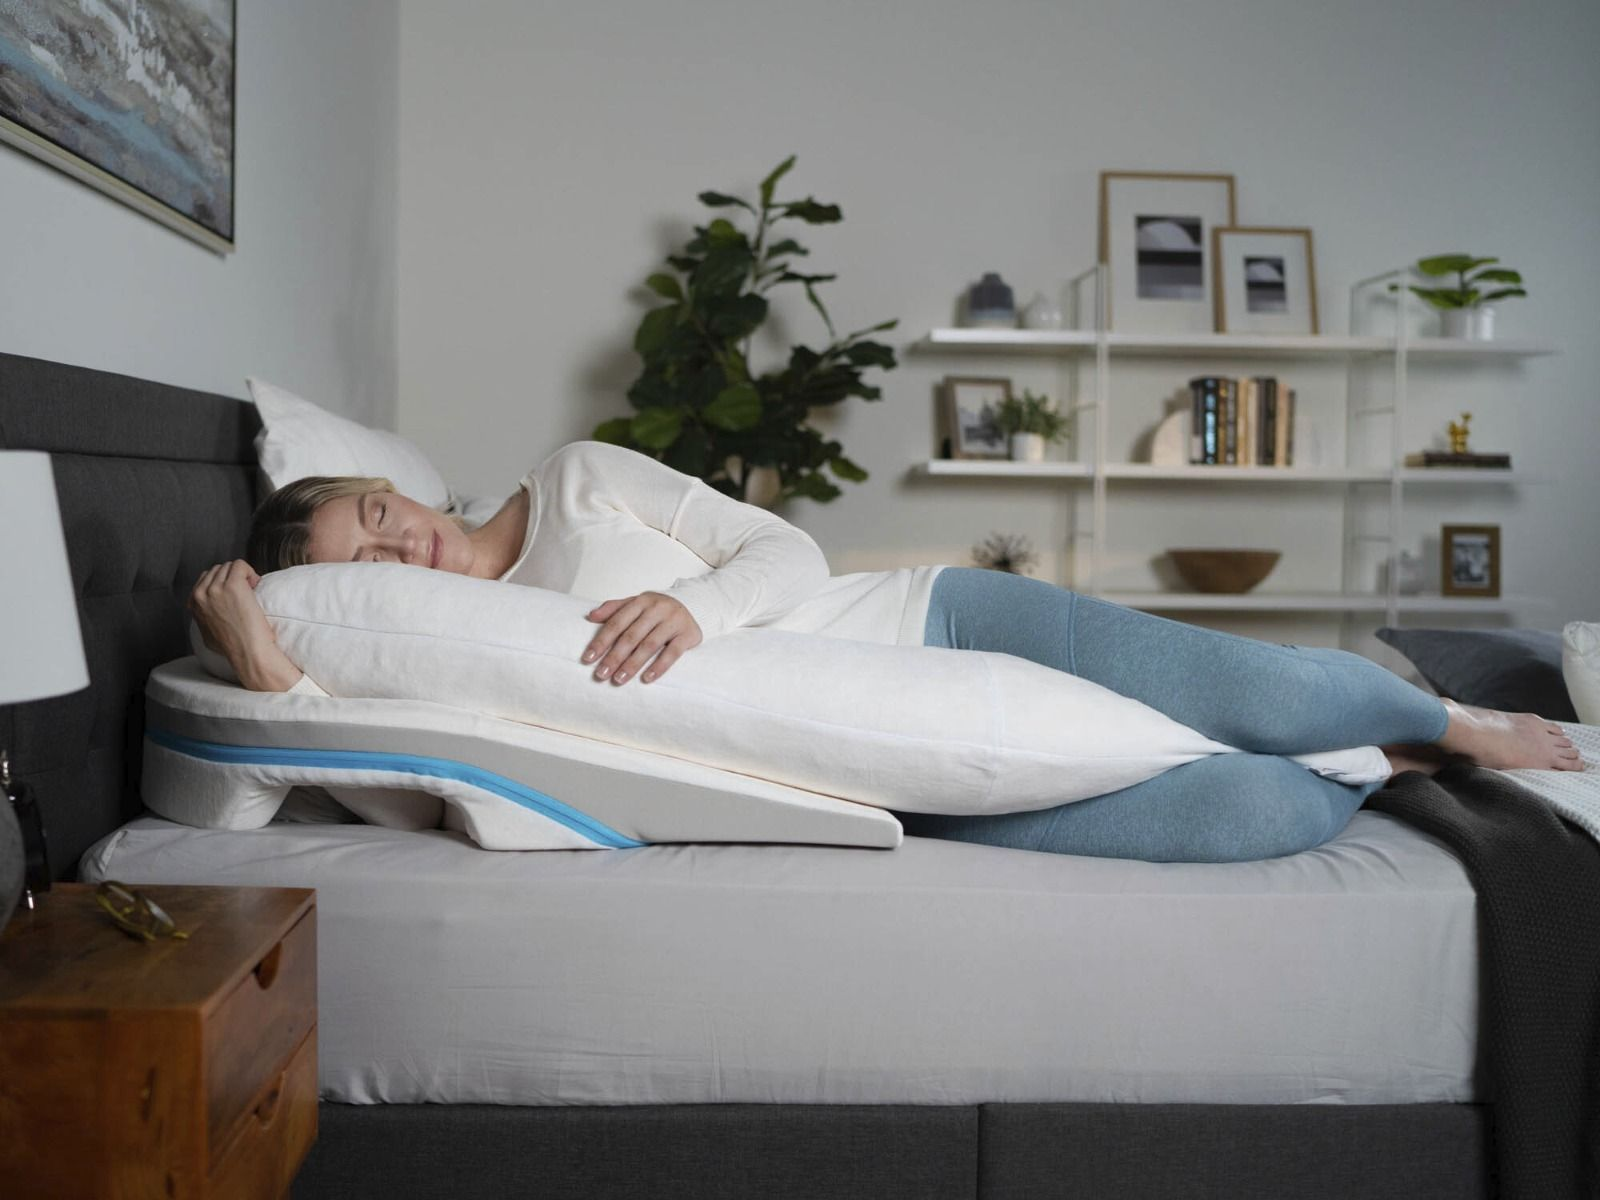 medcline lp shoulder relief system wedge body pillow 1439 02